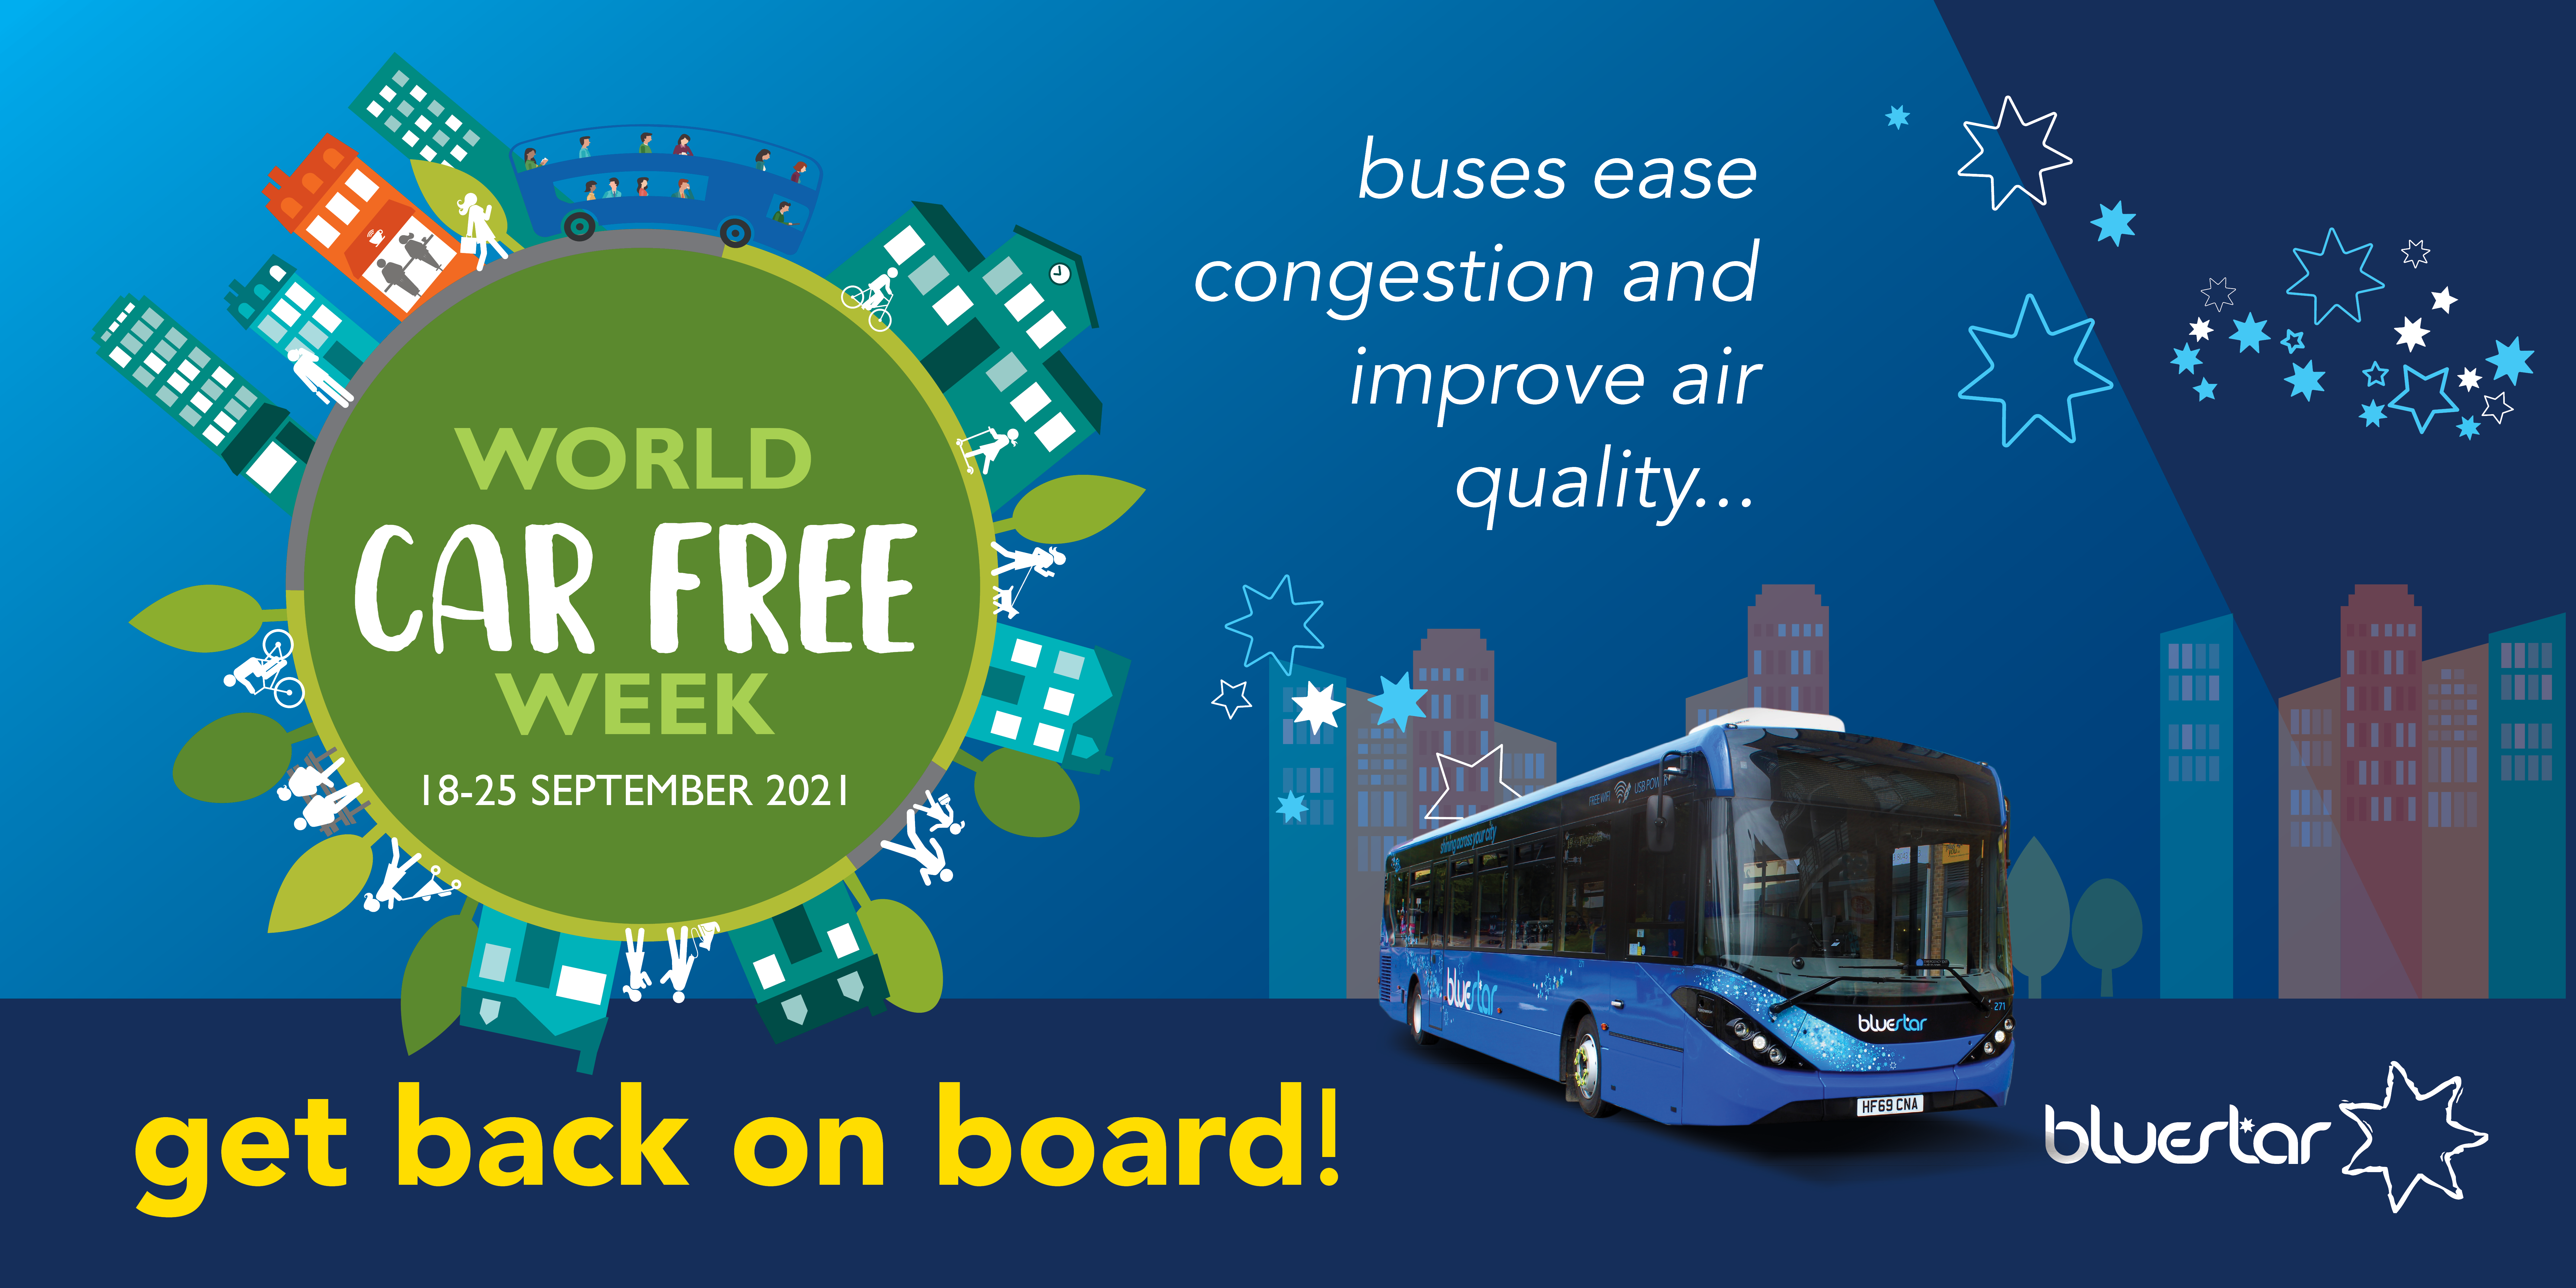 world car free week 18 - 25 september